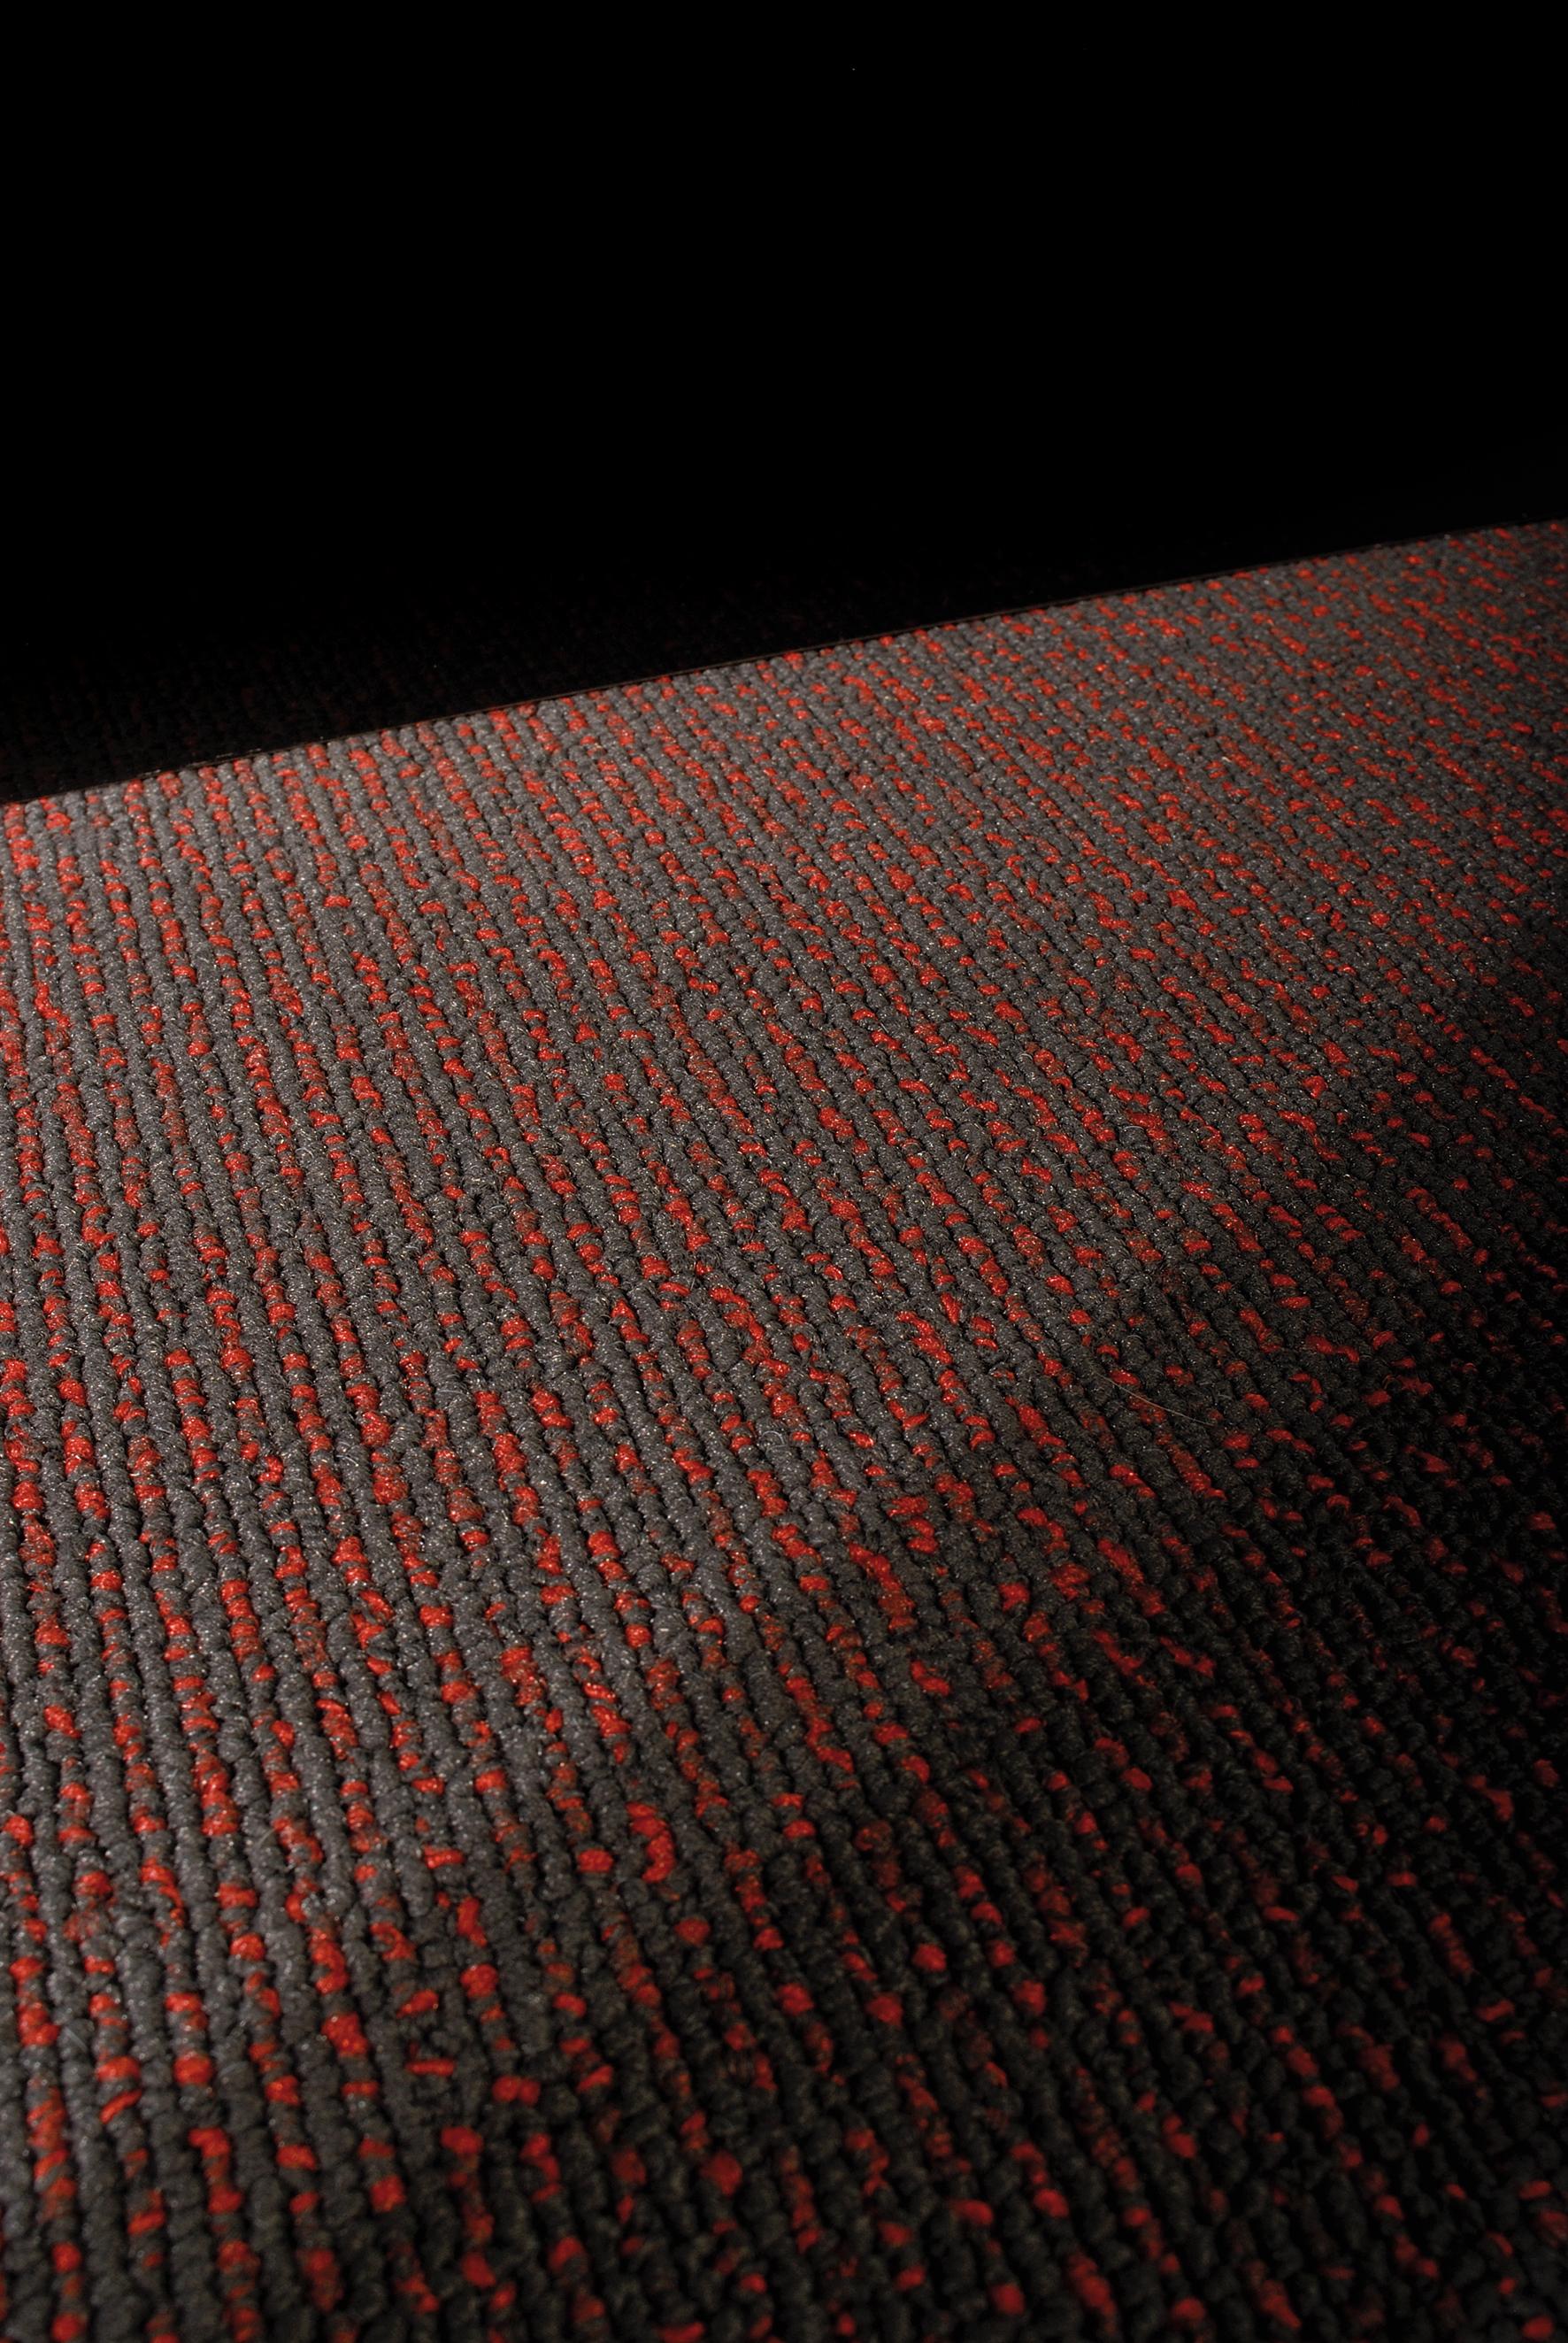 Tisca Tiara Interior Textiles Carpets Carpets